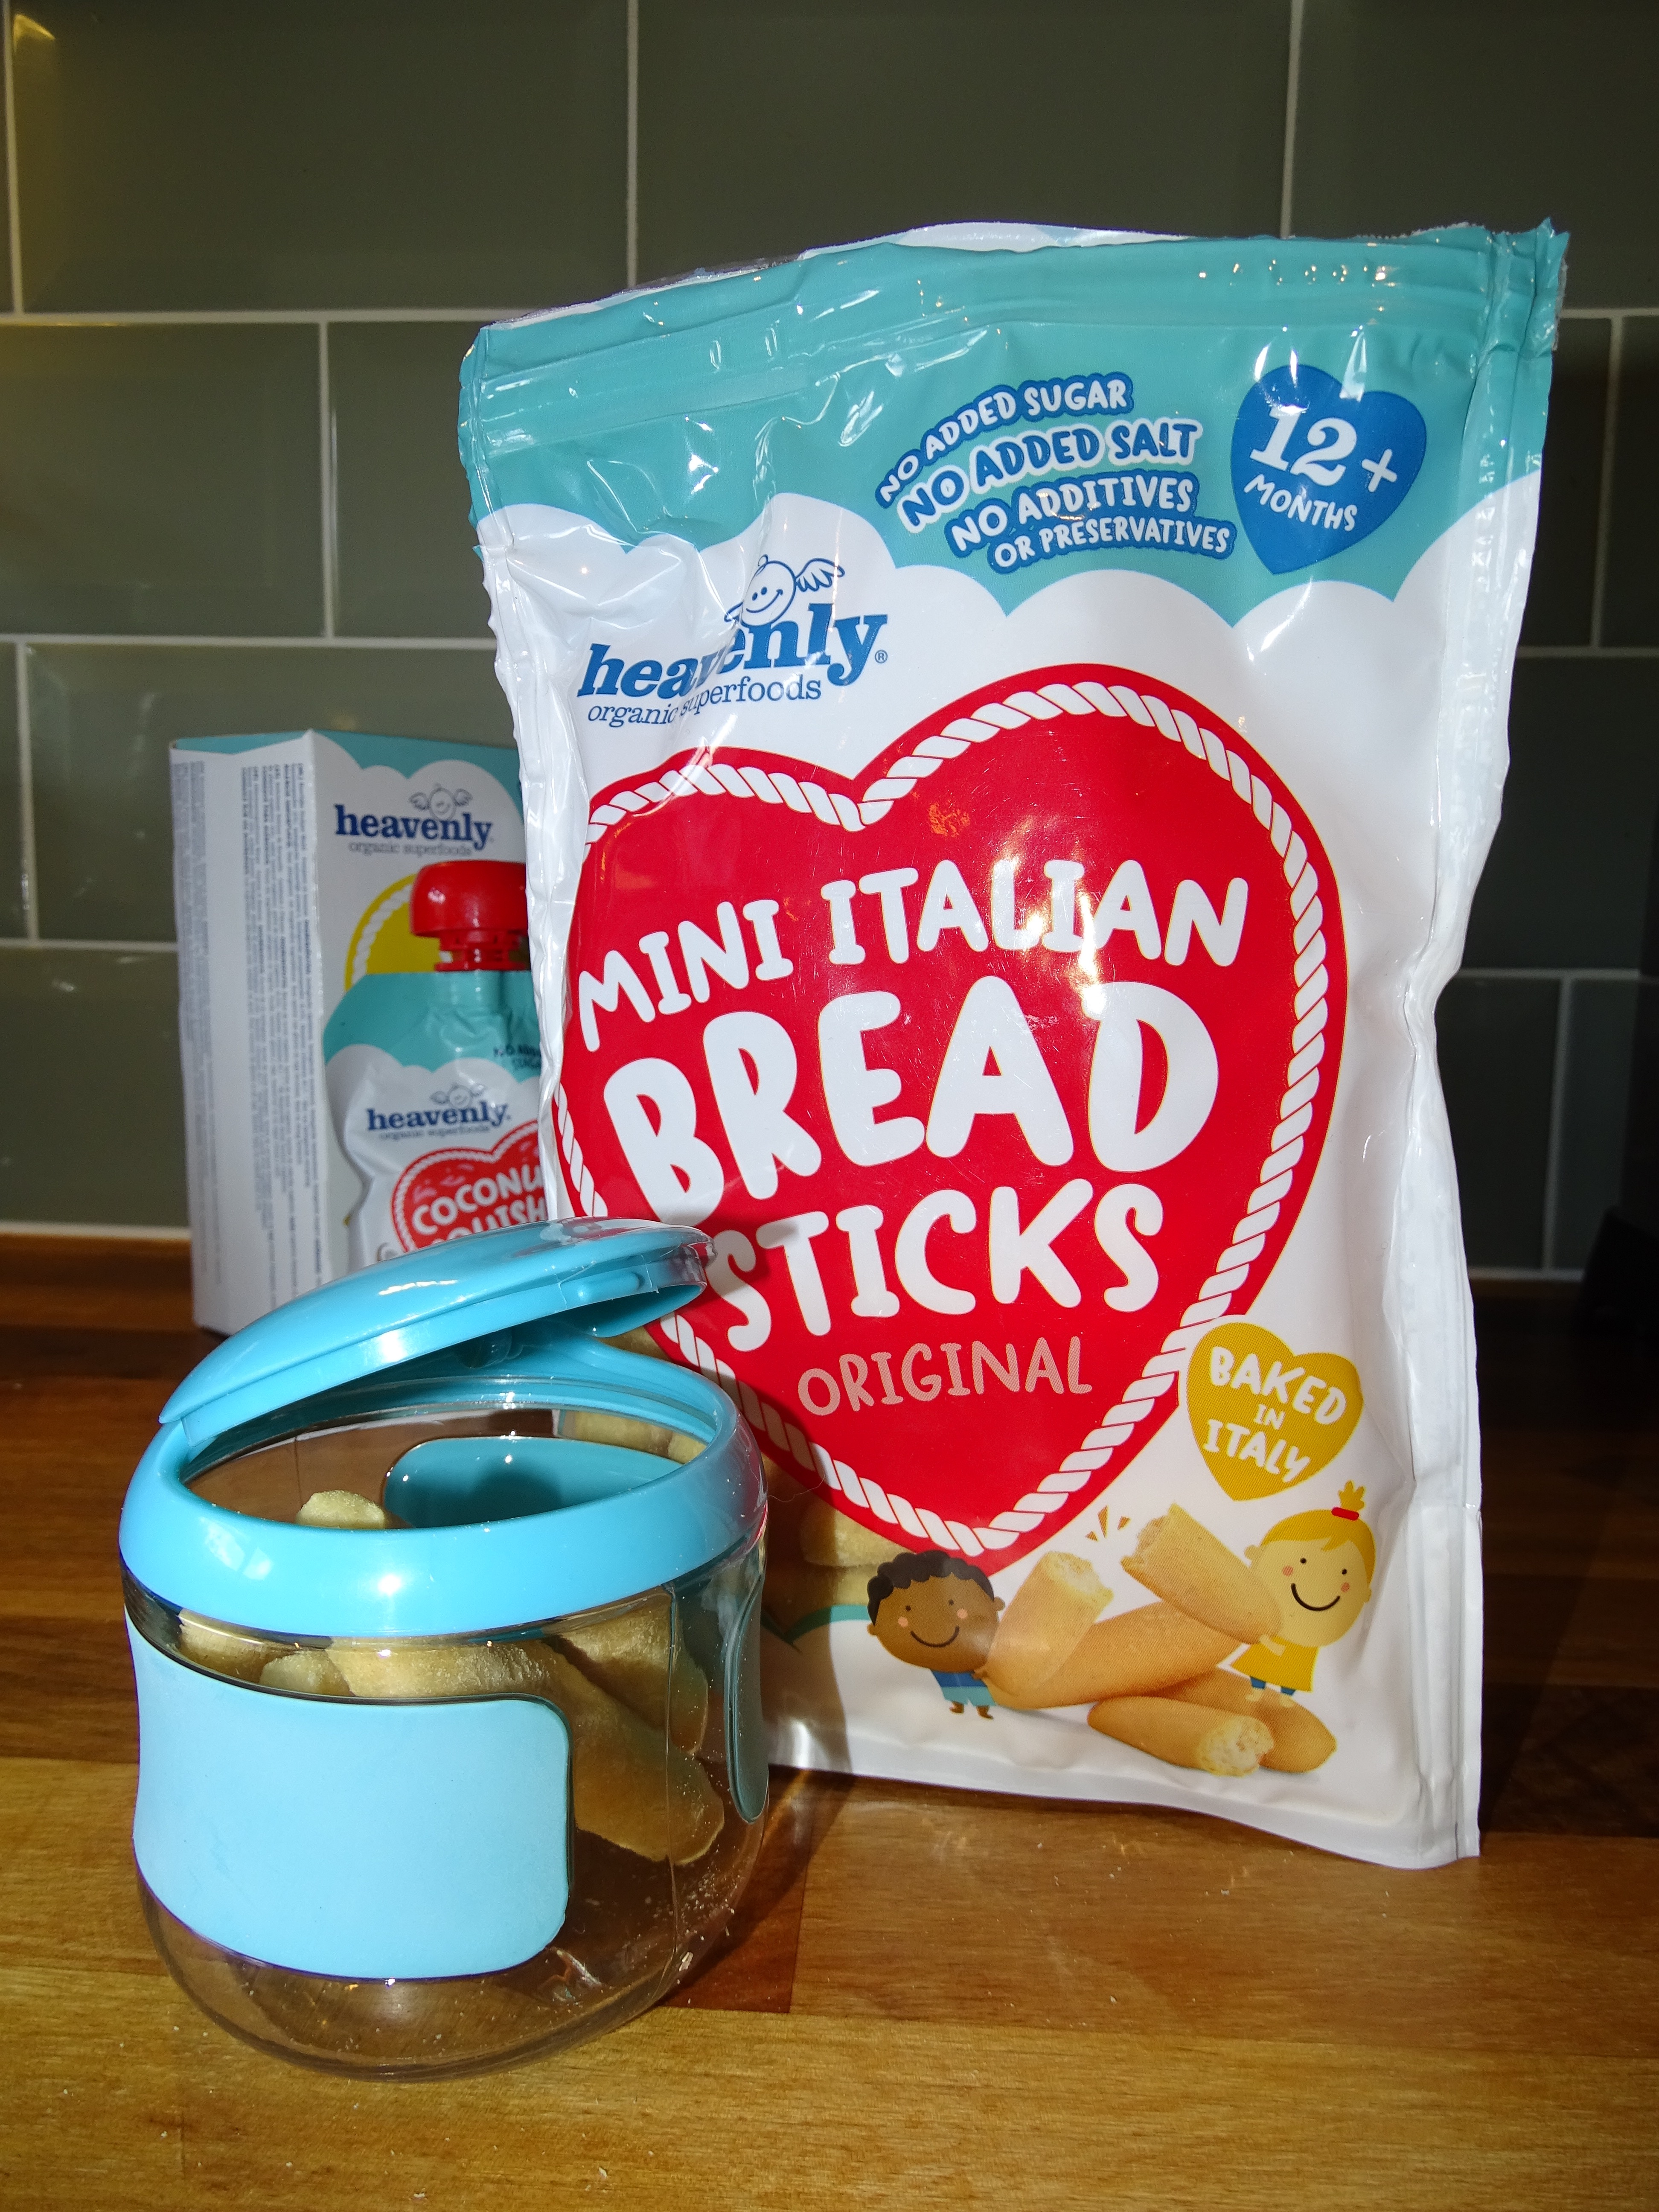 snacking bread sticks